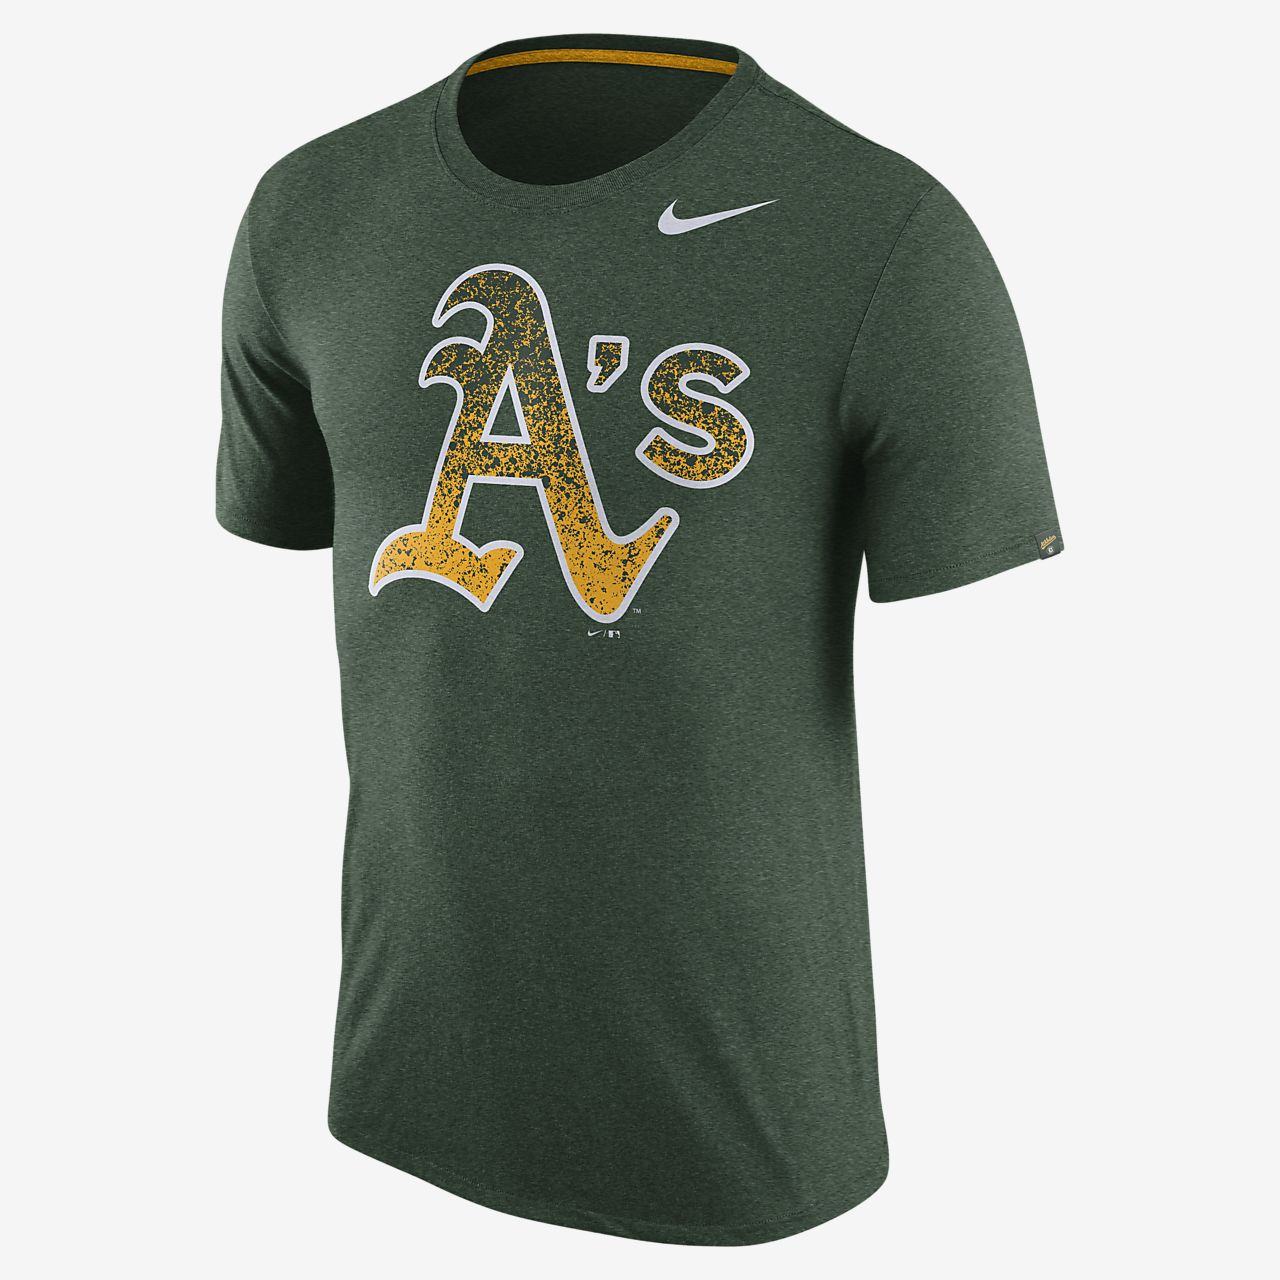 Nike Marled (MLB A's) Men's T-Shirts Black